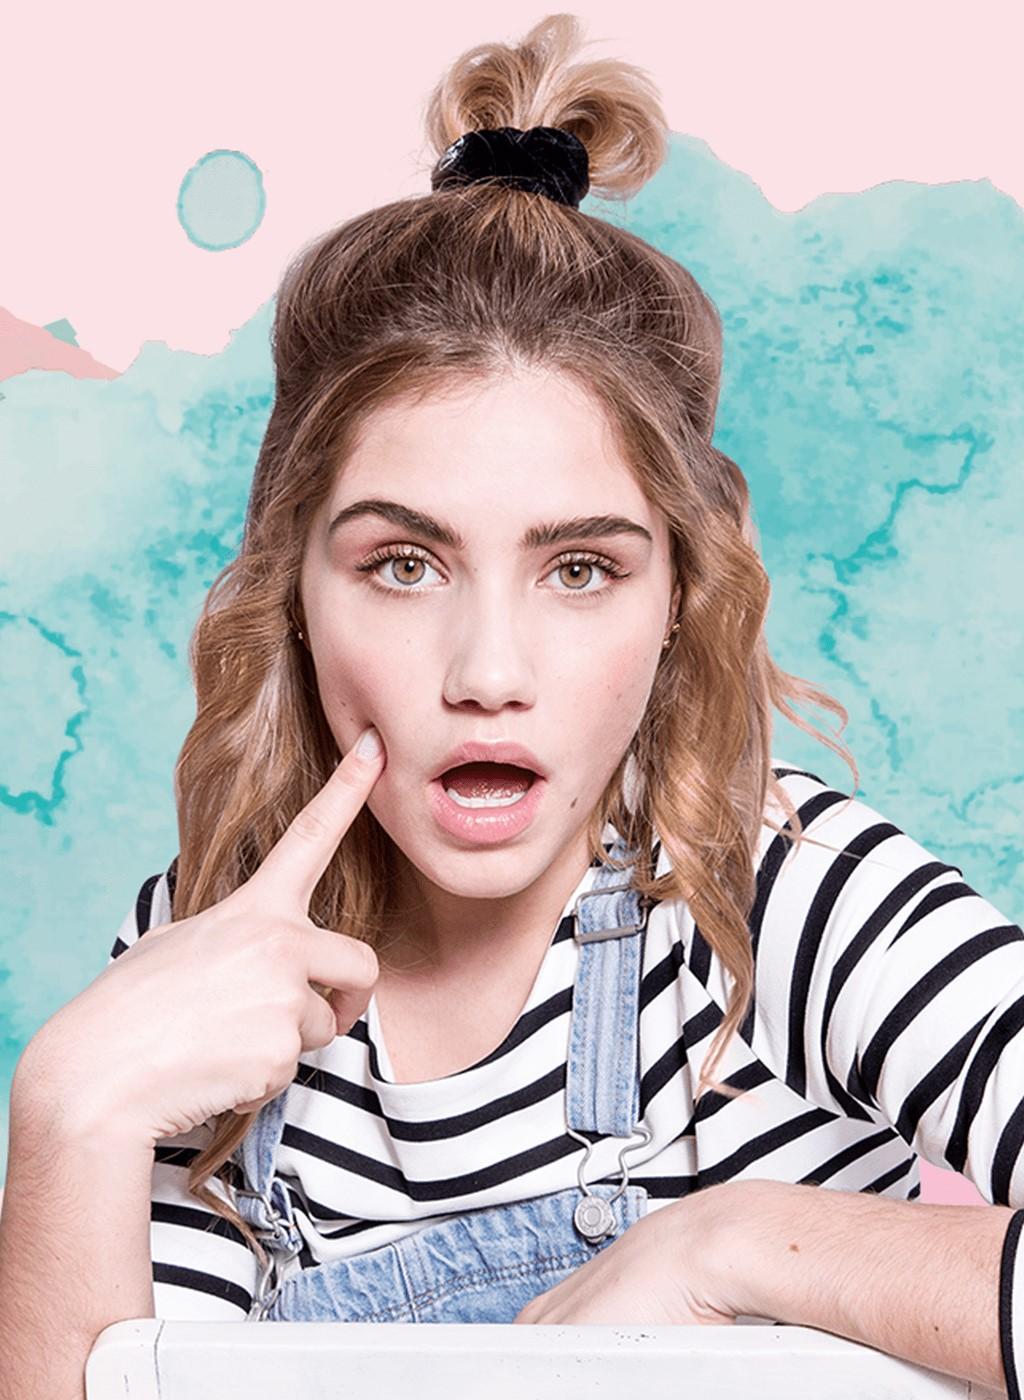 how-to-style-hair-accessories-scrunchies-hairstyles-ways-to-wear-ponytail-stripe-black-halfup.jpg